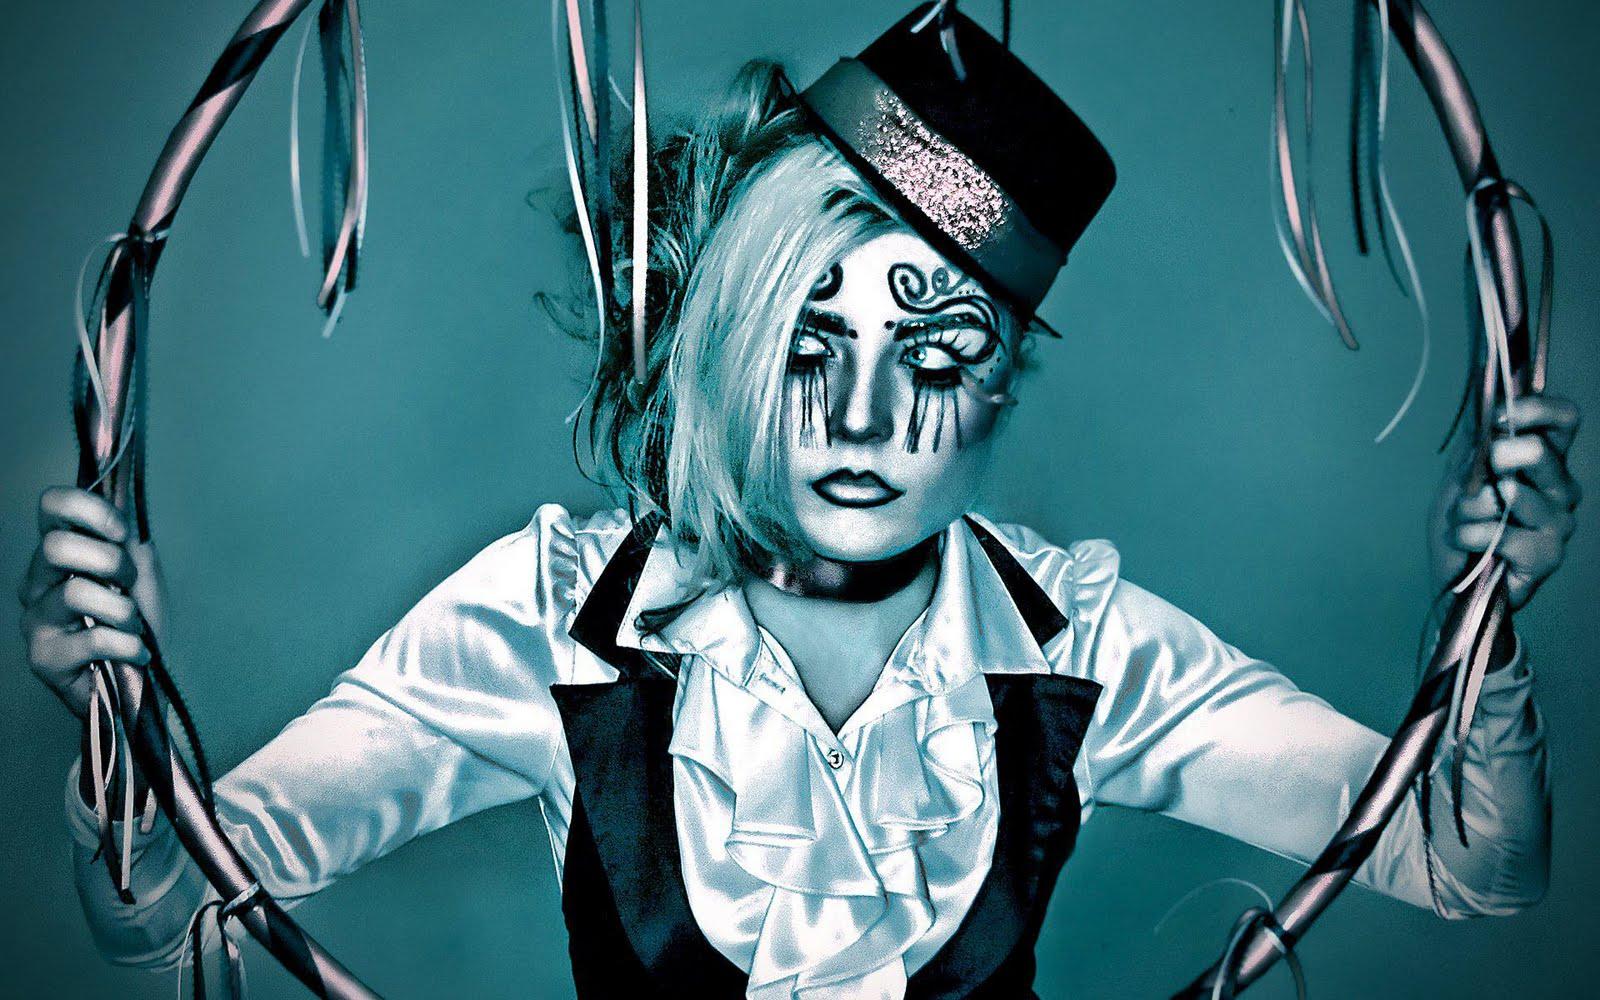 http://1.bp.blogspot.com/_V7qhI_ZYVQM/S7sZfoD9z0I/AAAAAAAAGu4/lO5FipVdoLQ/s1600/laba-ws.blogspot.com_Art_Conceptual_HD_0022.jpg